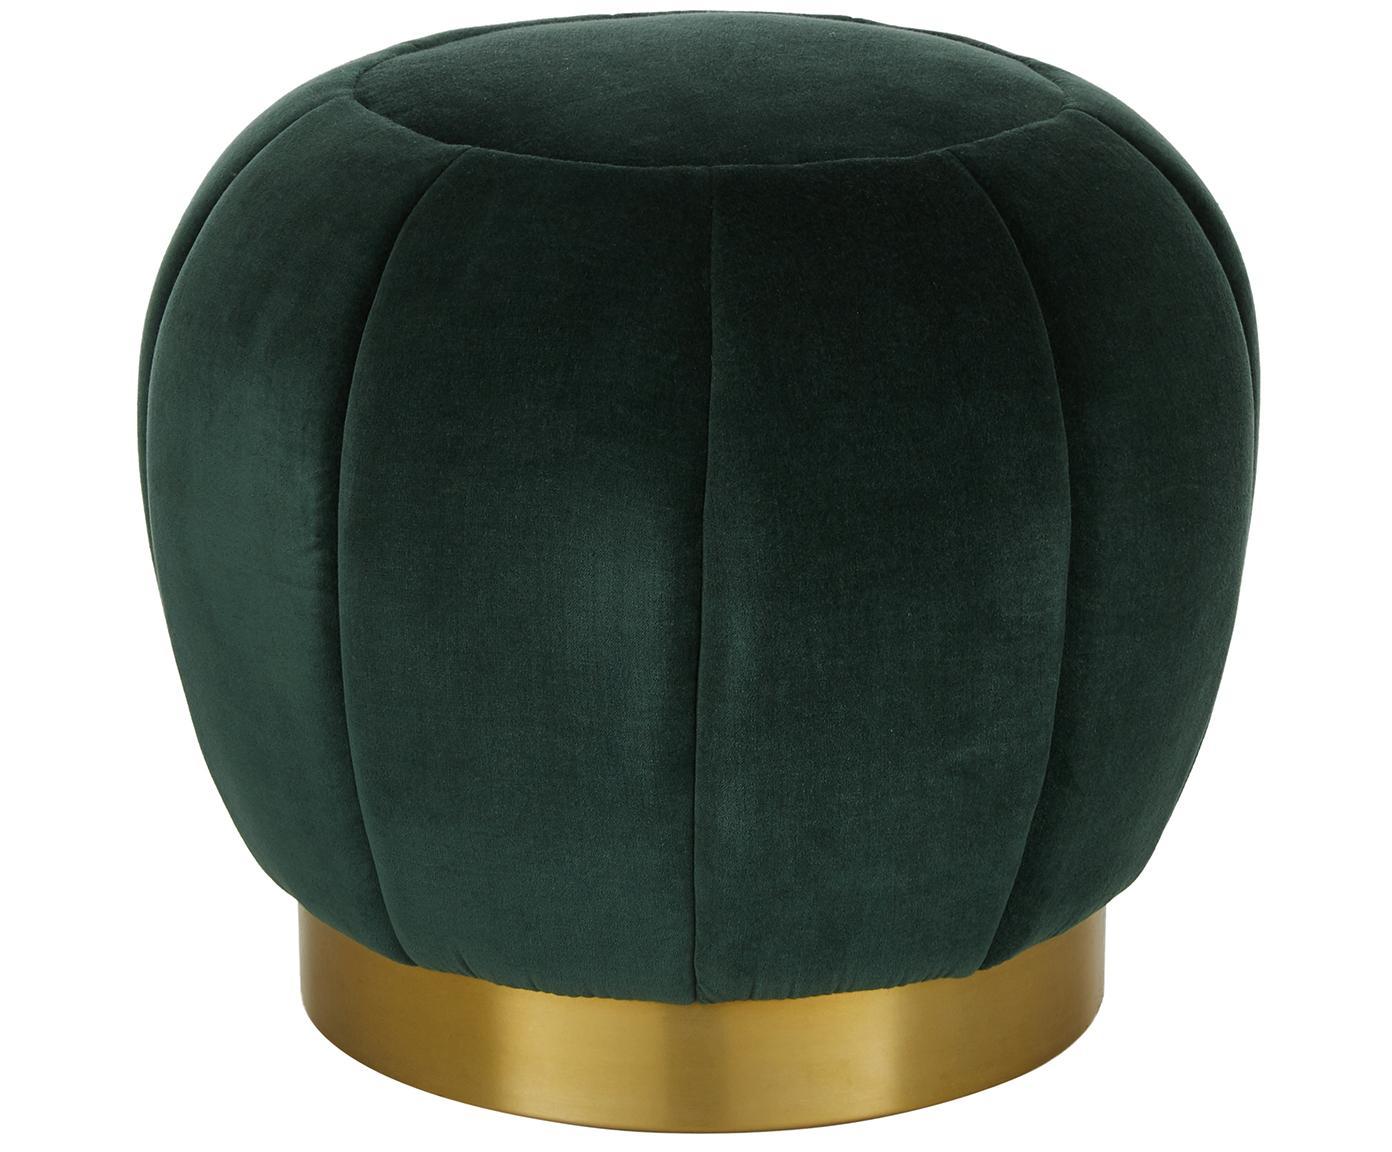 Pouf in velluto Hailee, Rivestimento: velluto, Rivestimento: verde scuro Base: dorato lucido, Ø 50 x Alt. 45 cm